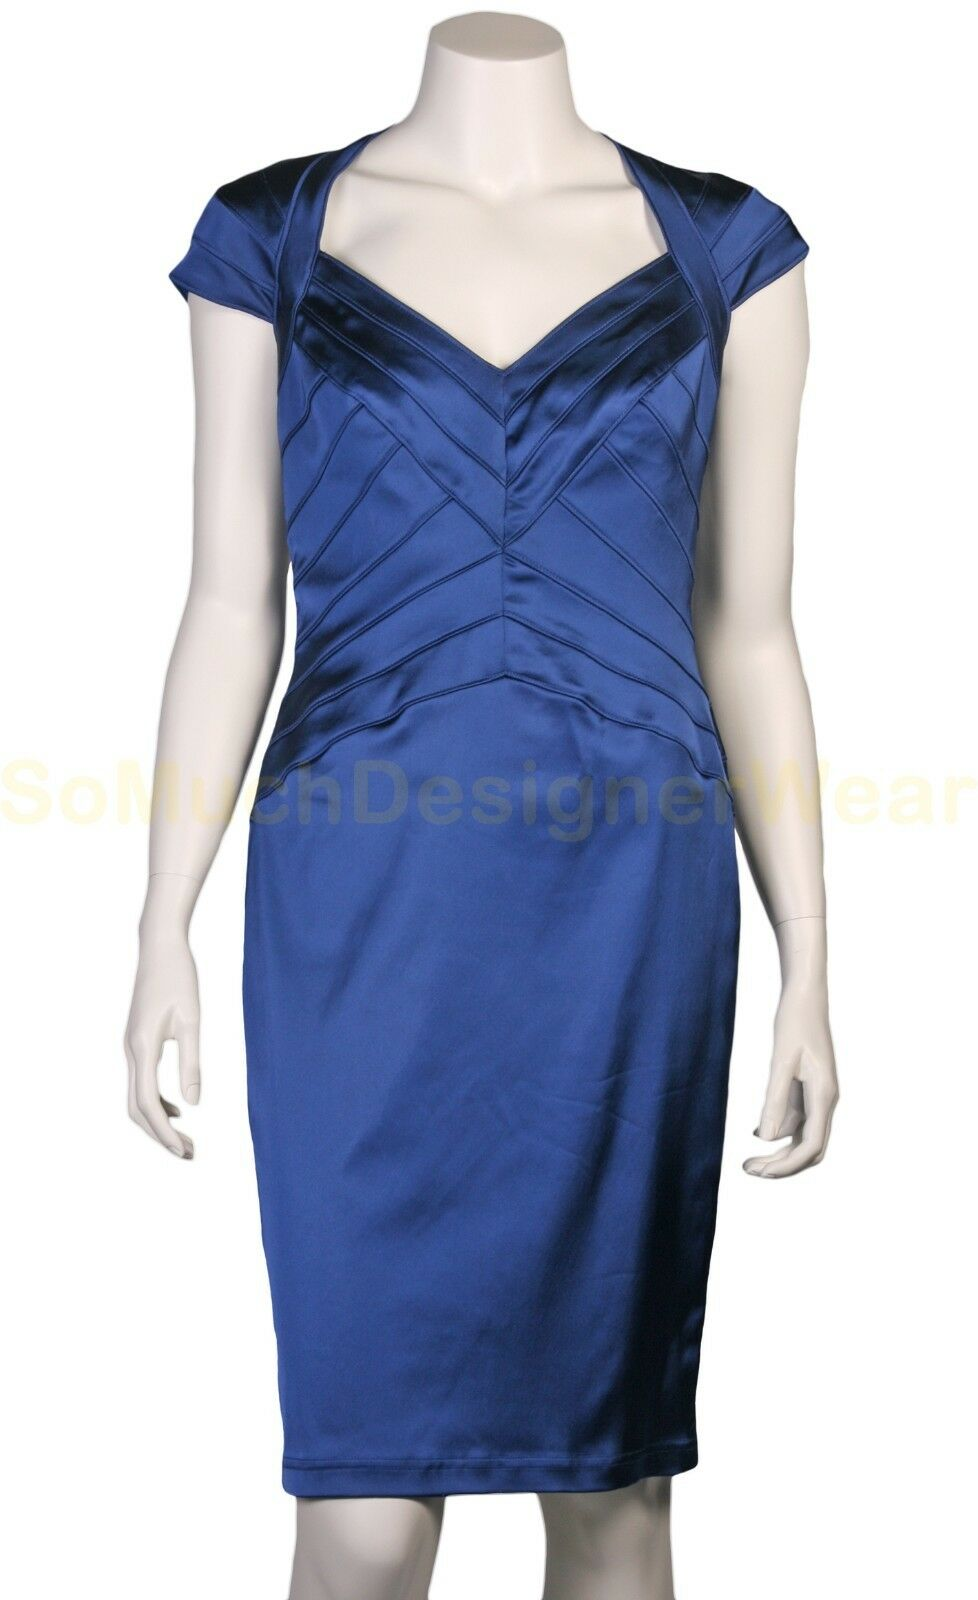 TADASHI jurk US8 EU36 azulw NIEUW+LABELS ap   250  servicio honesto